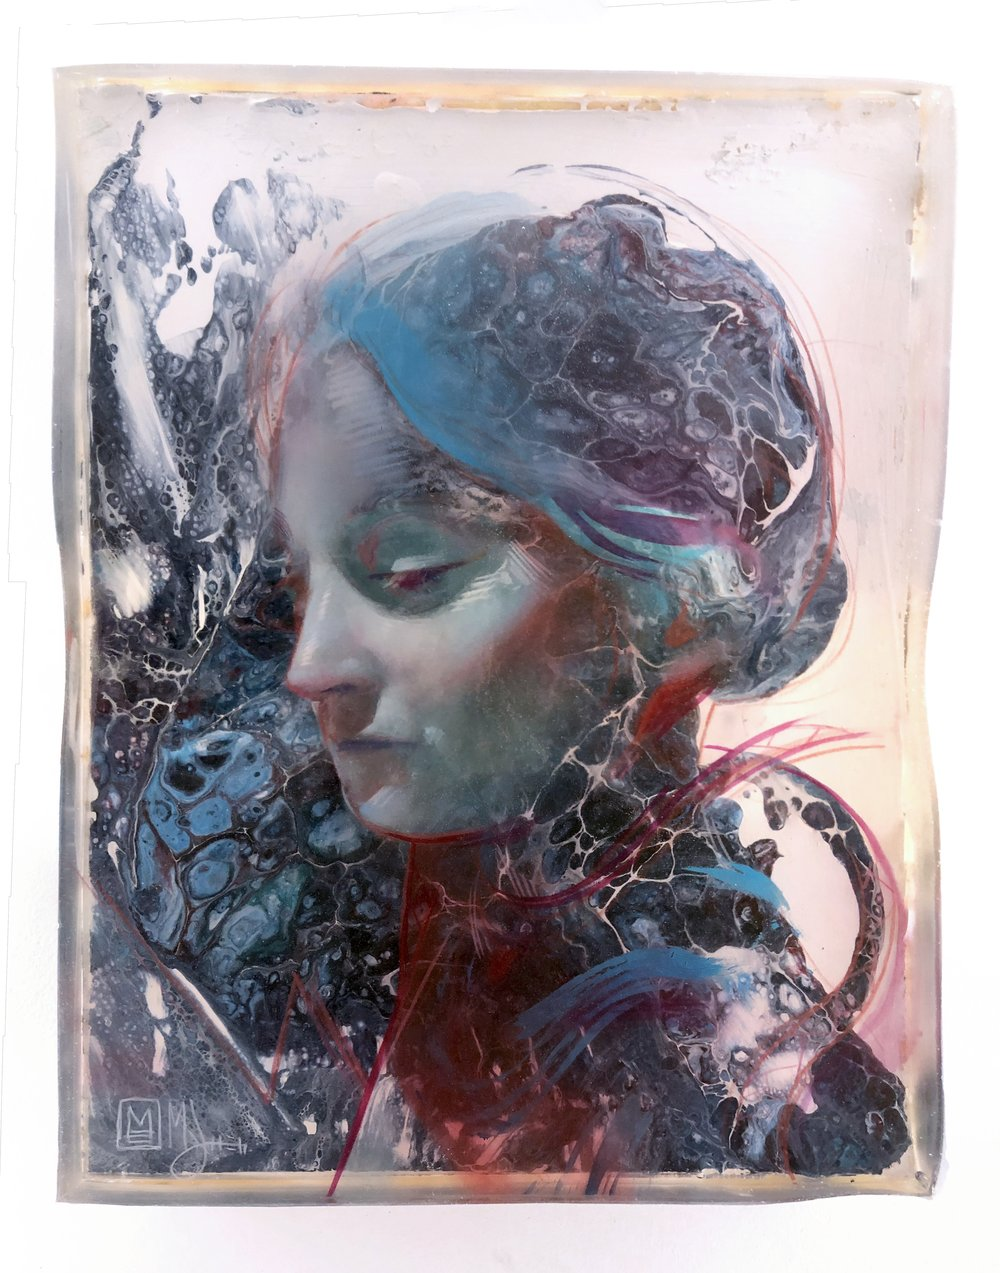 Marc Scheff - Mother Mary - Acrylic Block Print - 24x30- Edition 2 -  2019 - $750.jpg